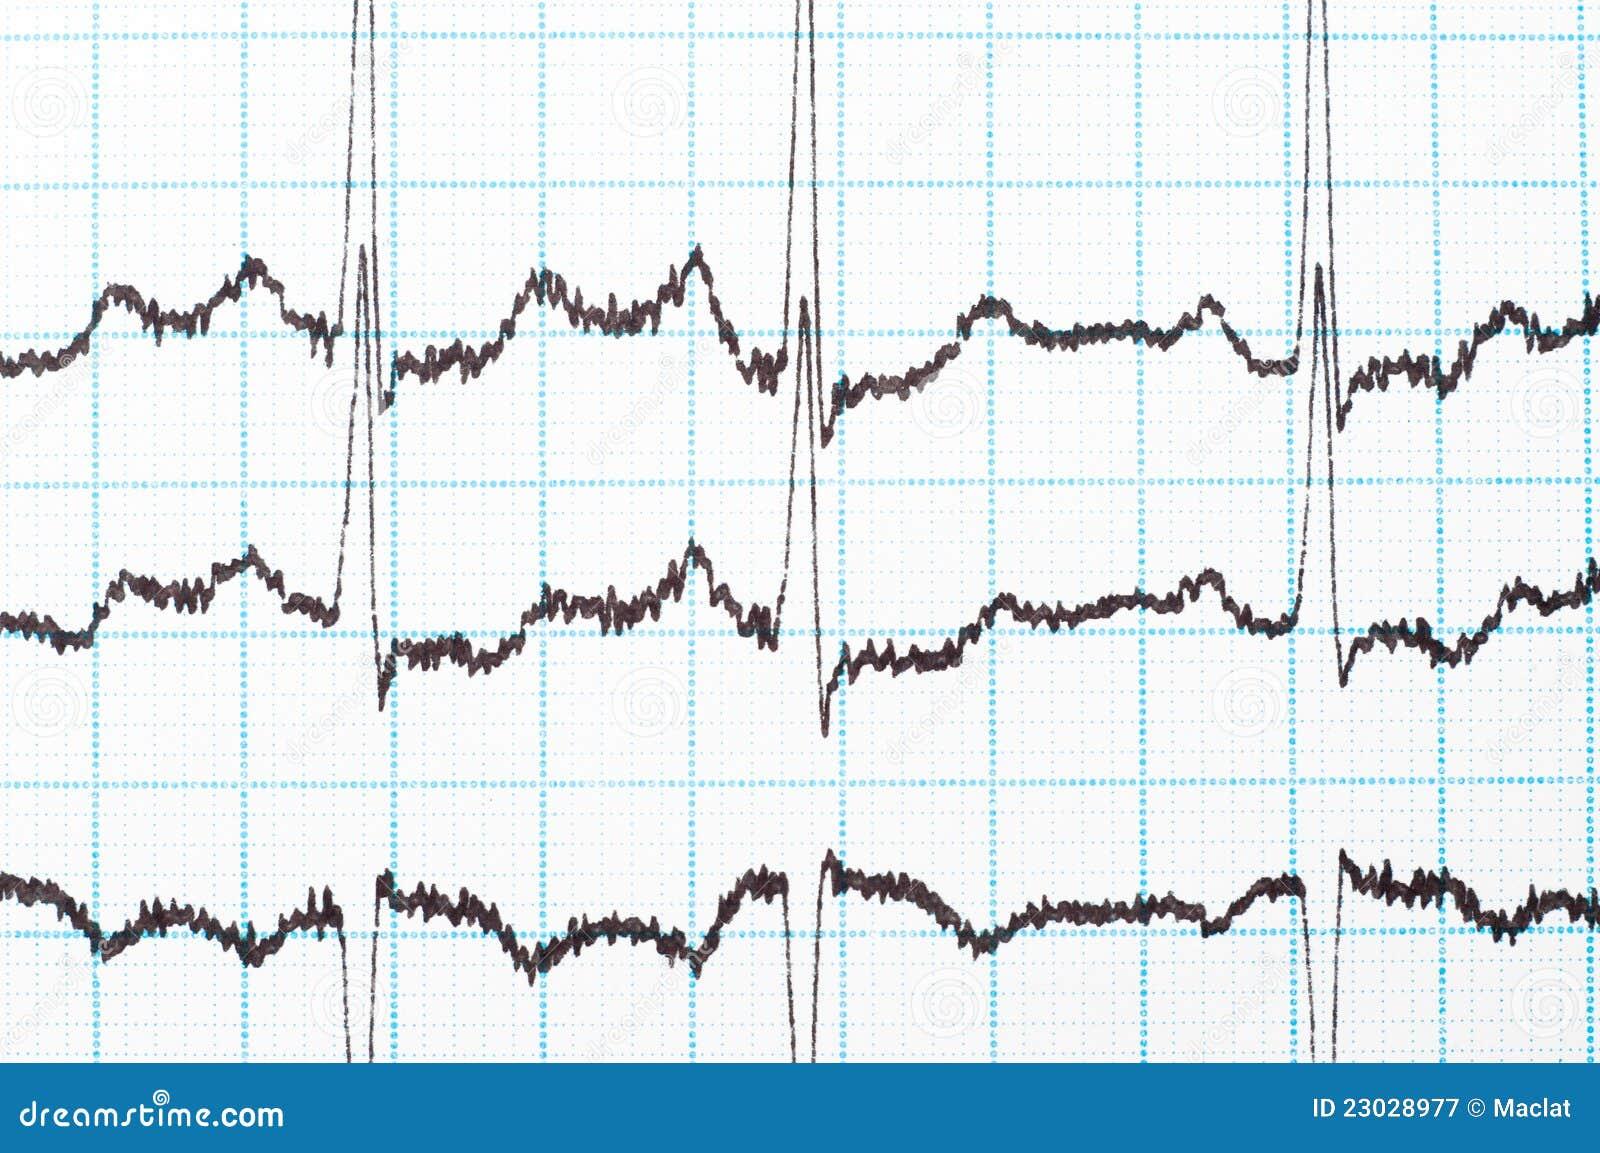 Ekg Diagram Stock Image  Image Of Test  Medicine